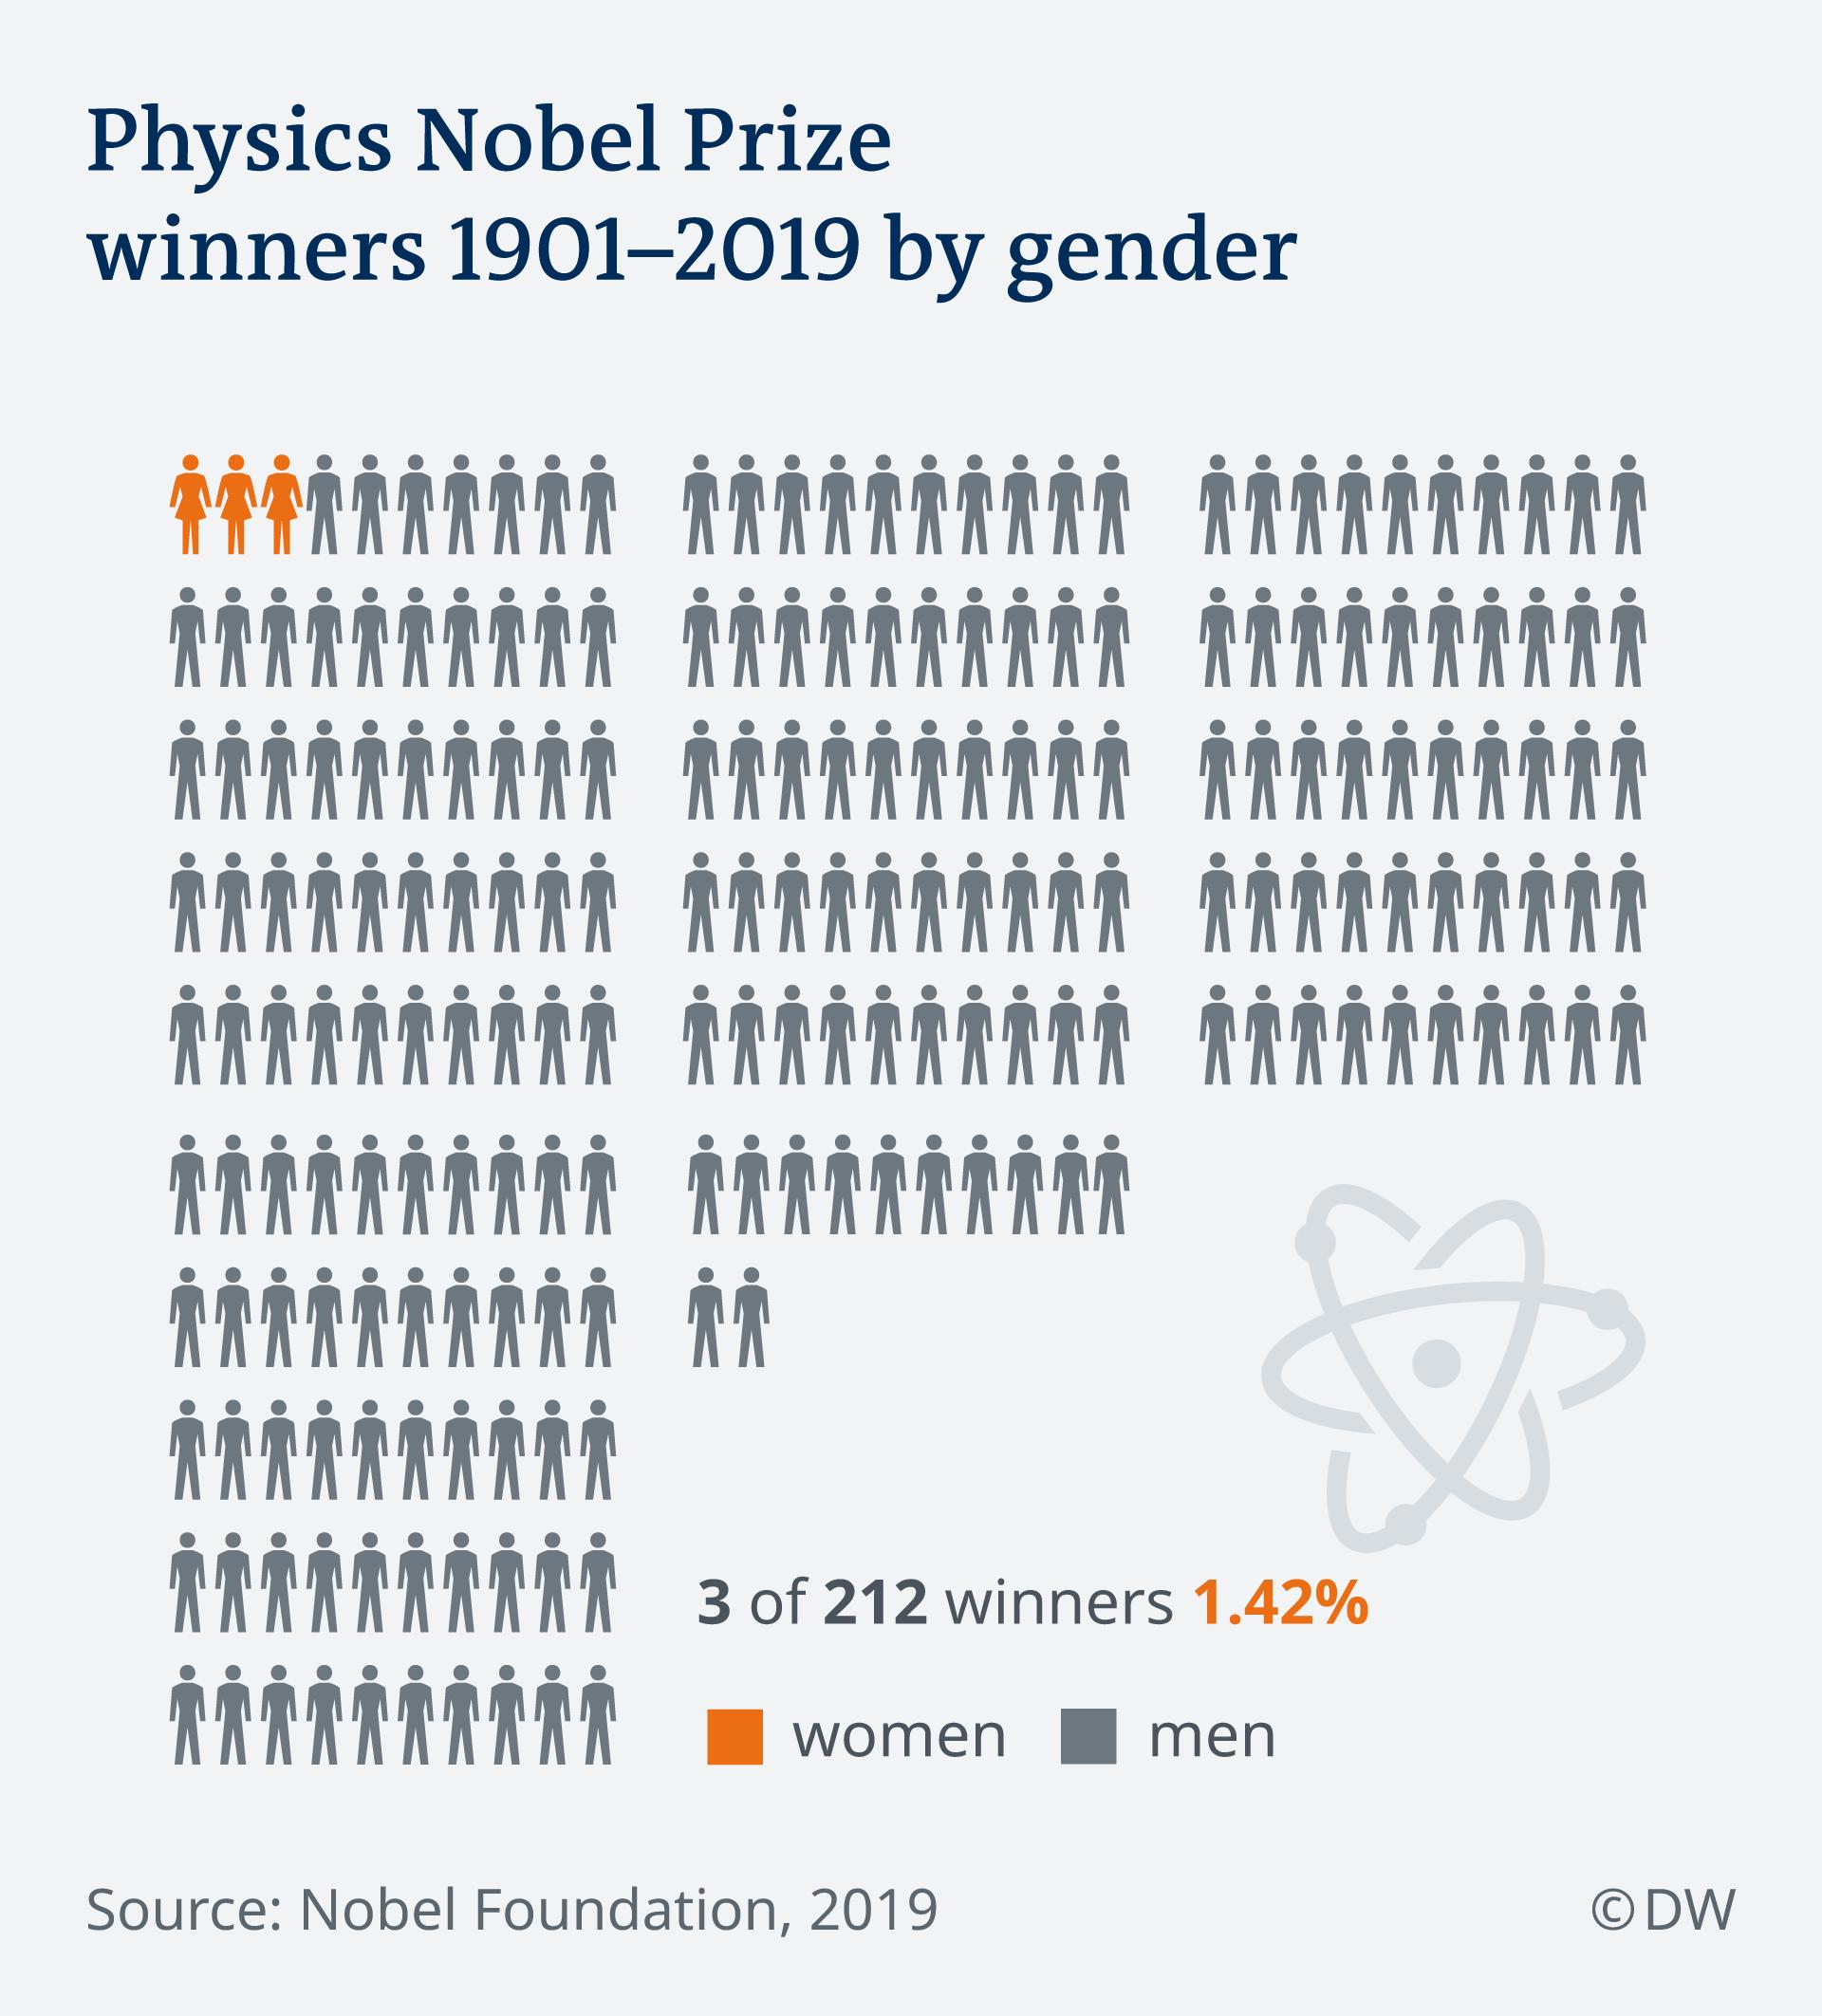 Infographic showing gender split of nobel prize winners